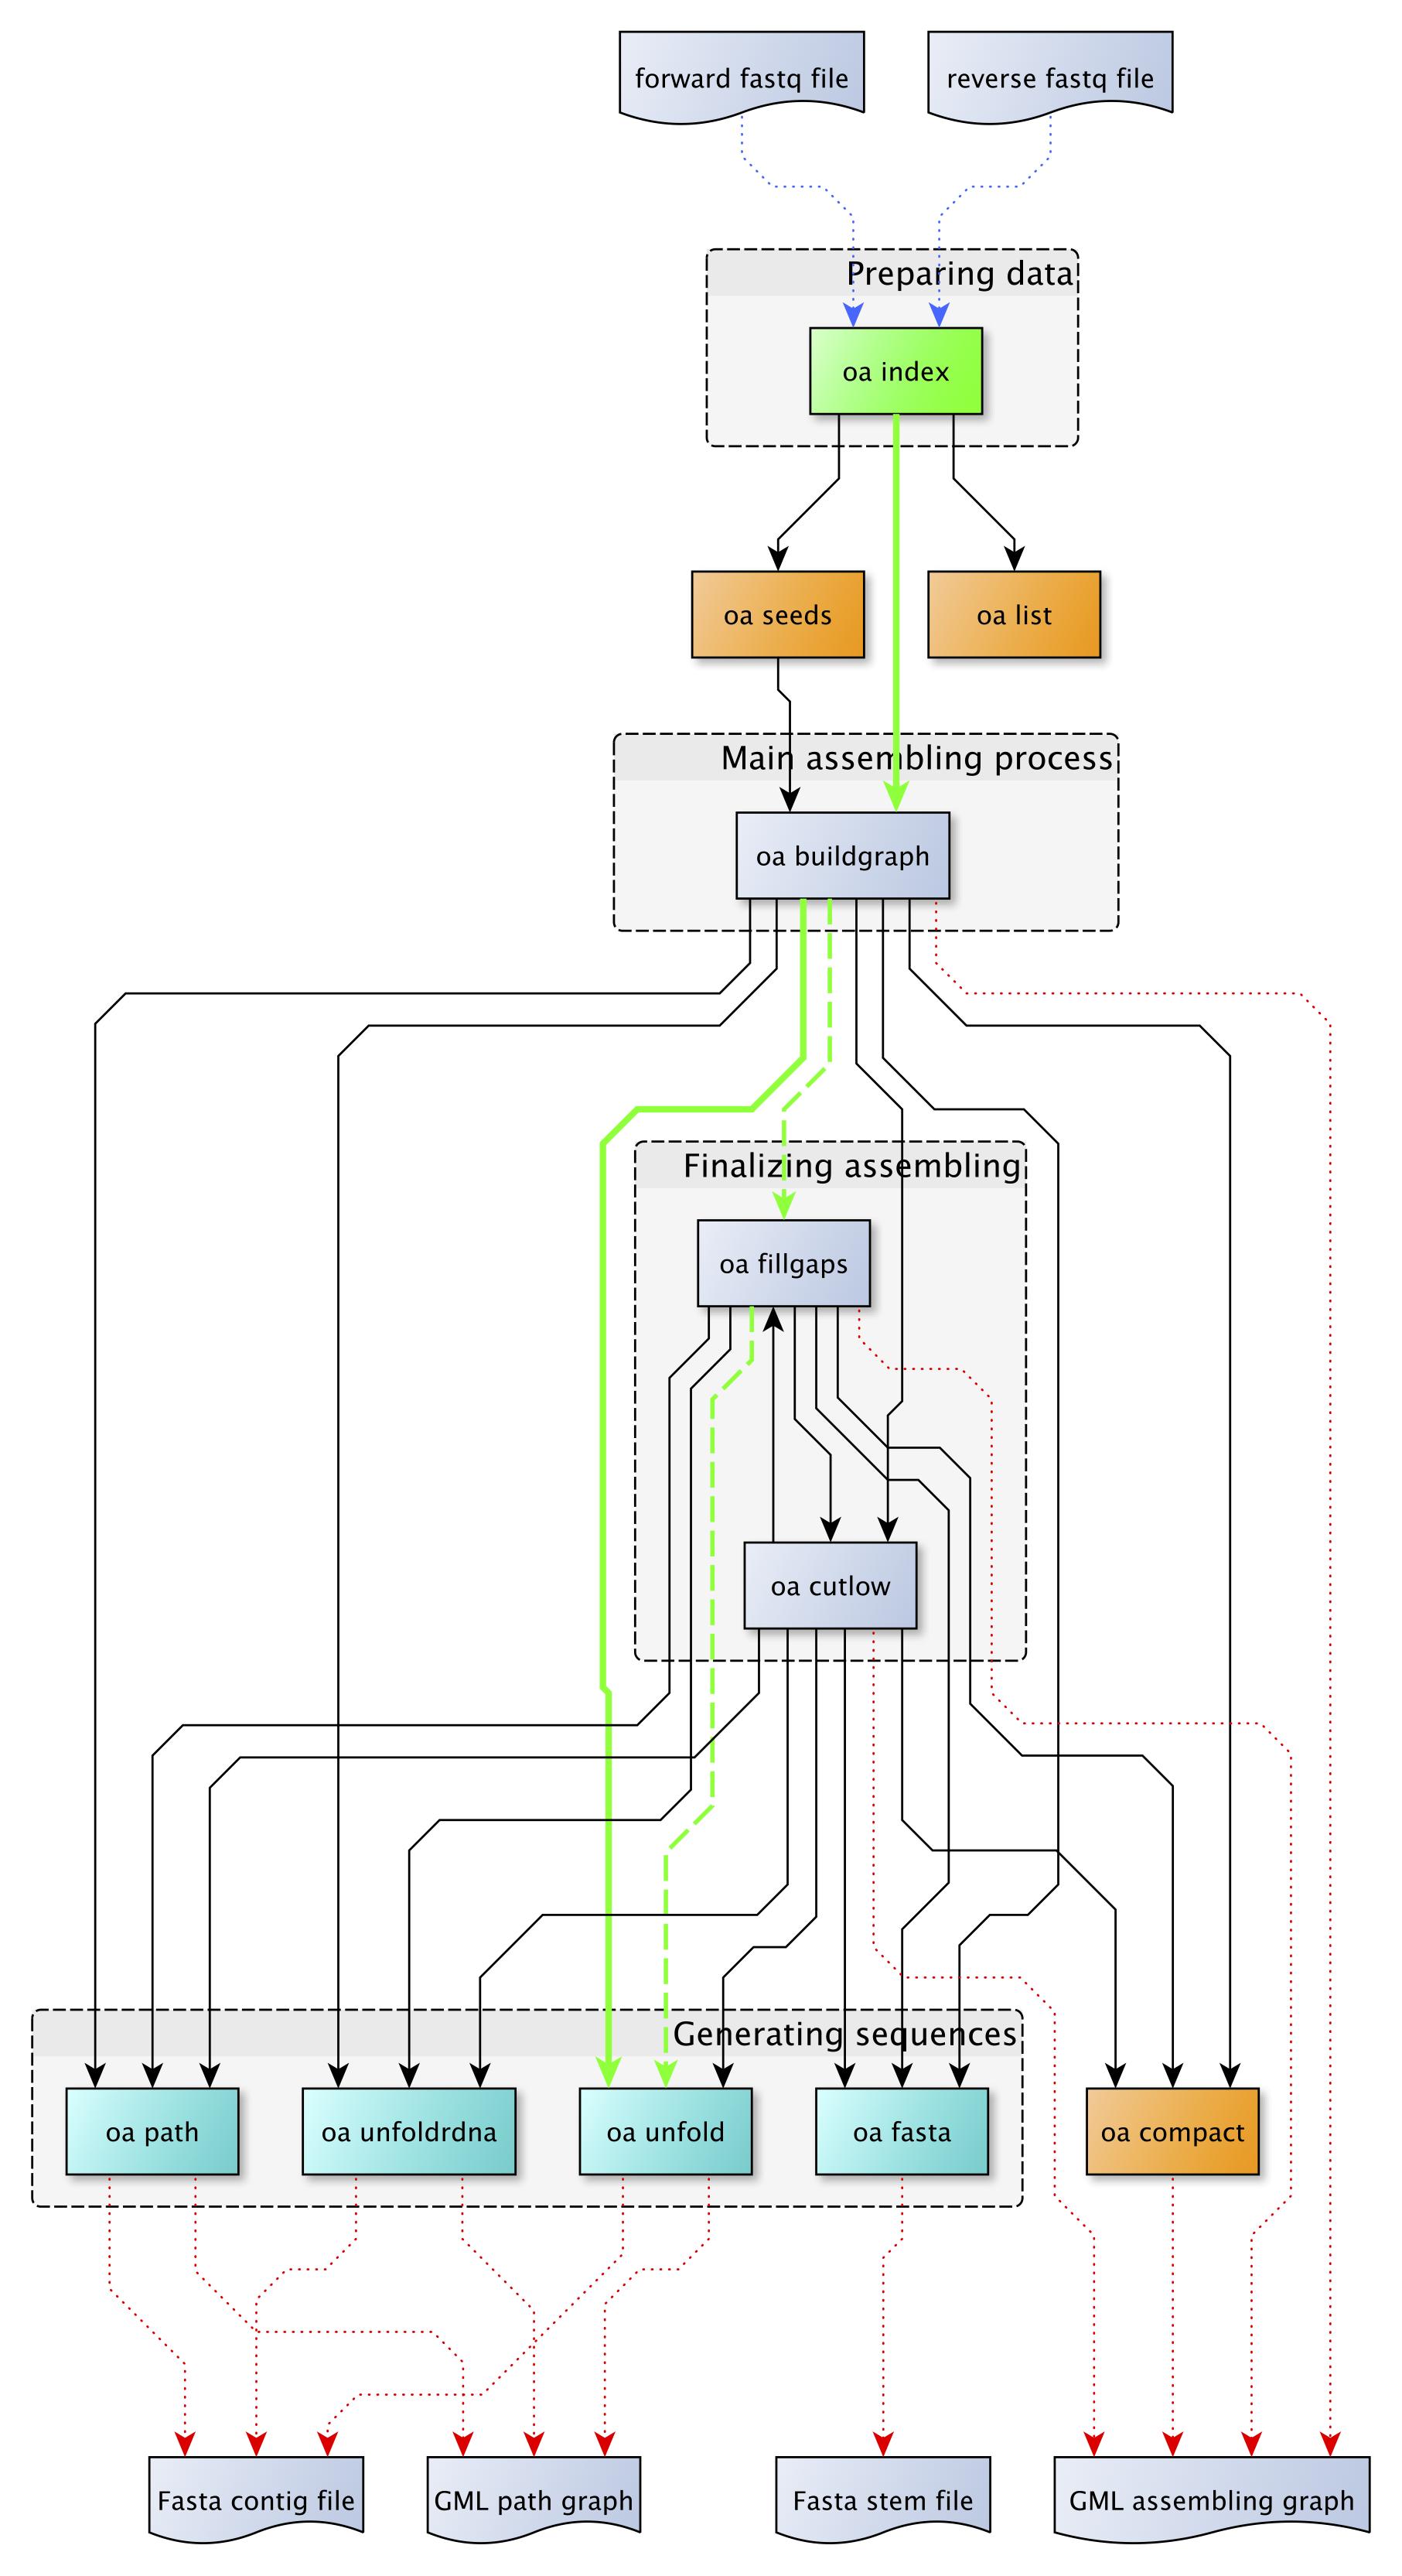 doc/sphinx/source/command-flowgram.png